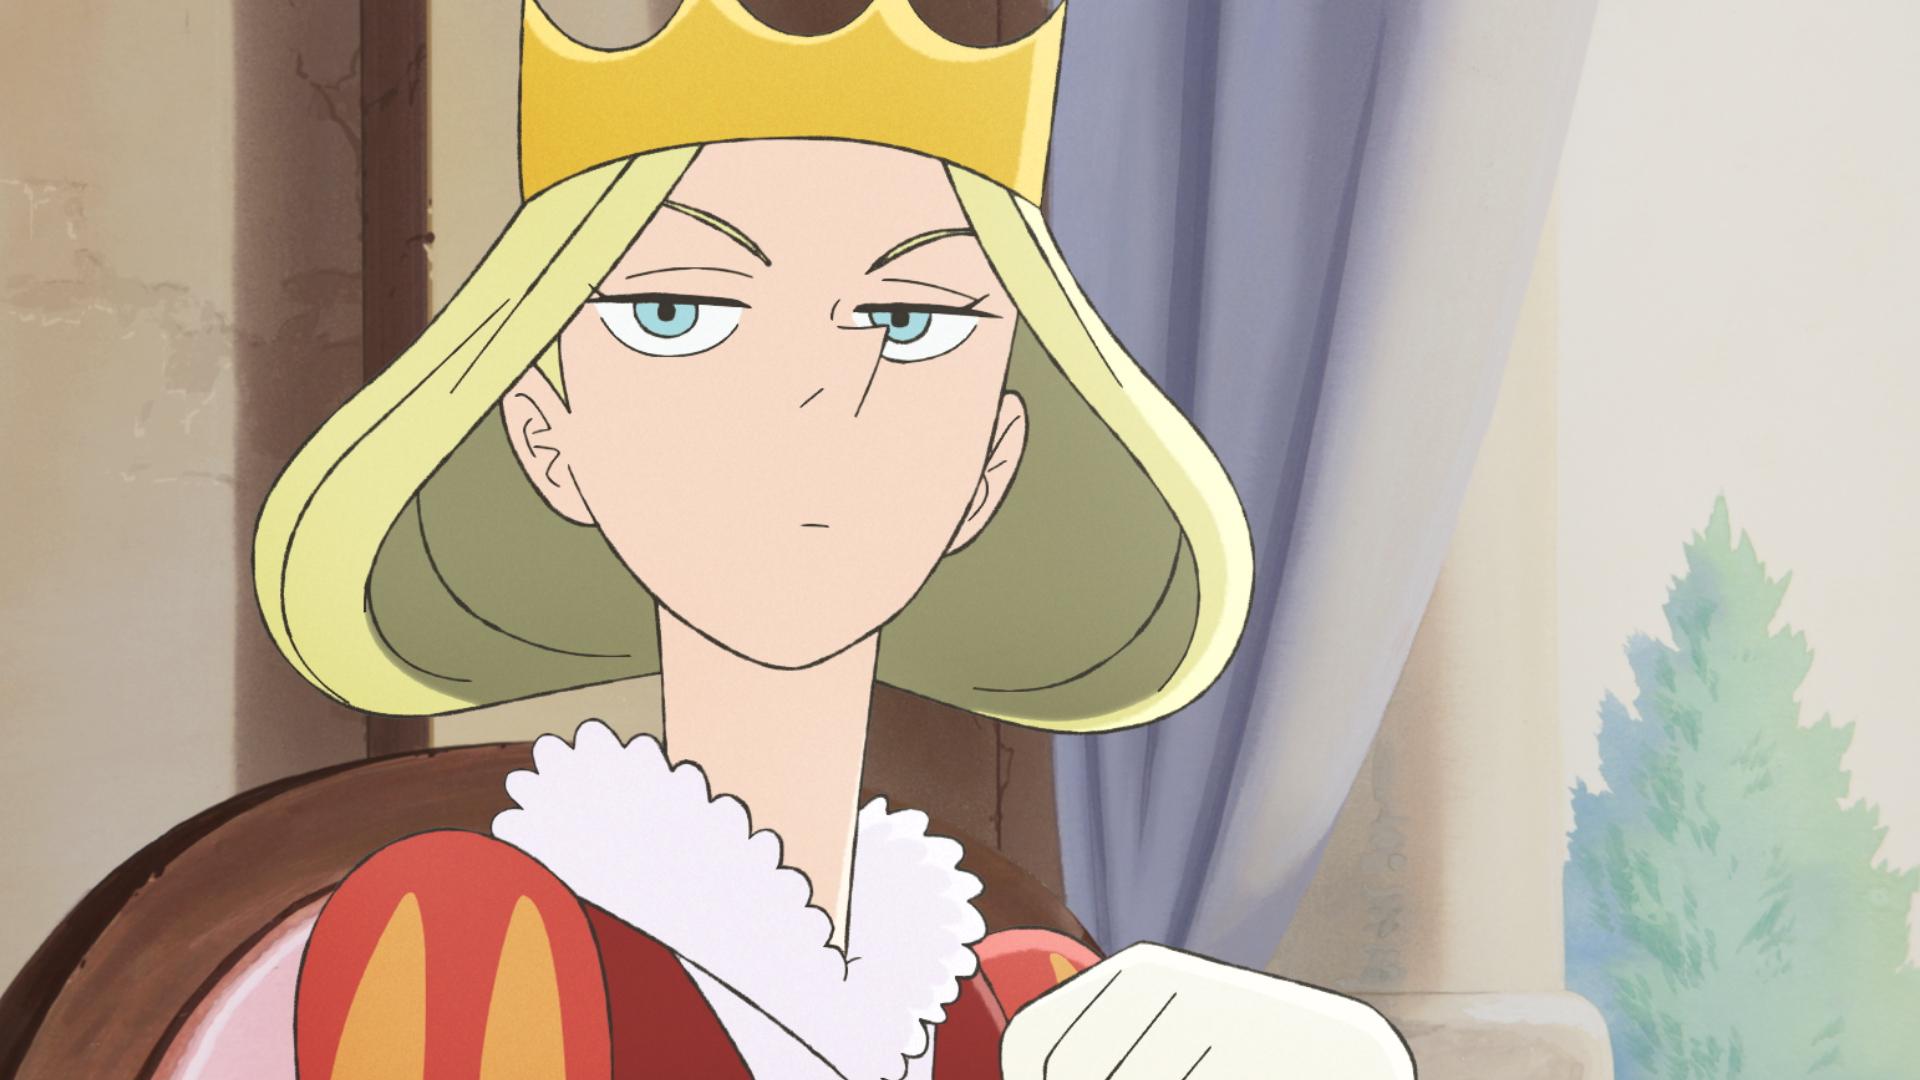 TVアニメ「王様ランキング」新規カット